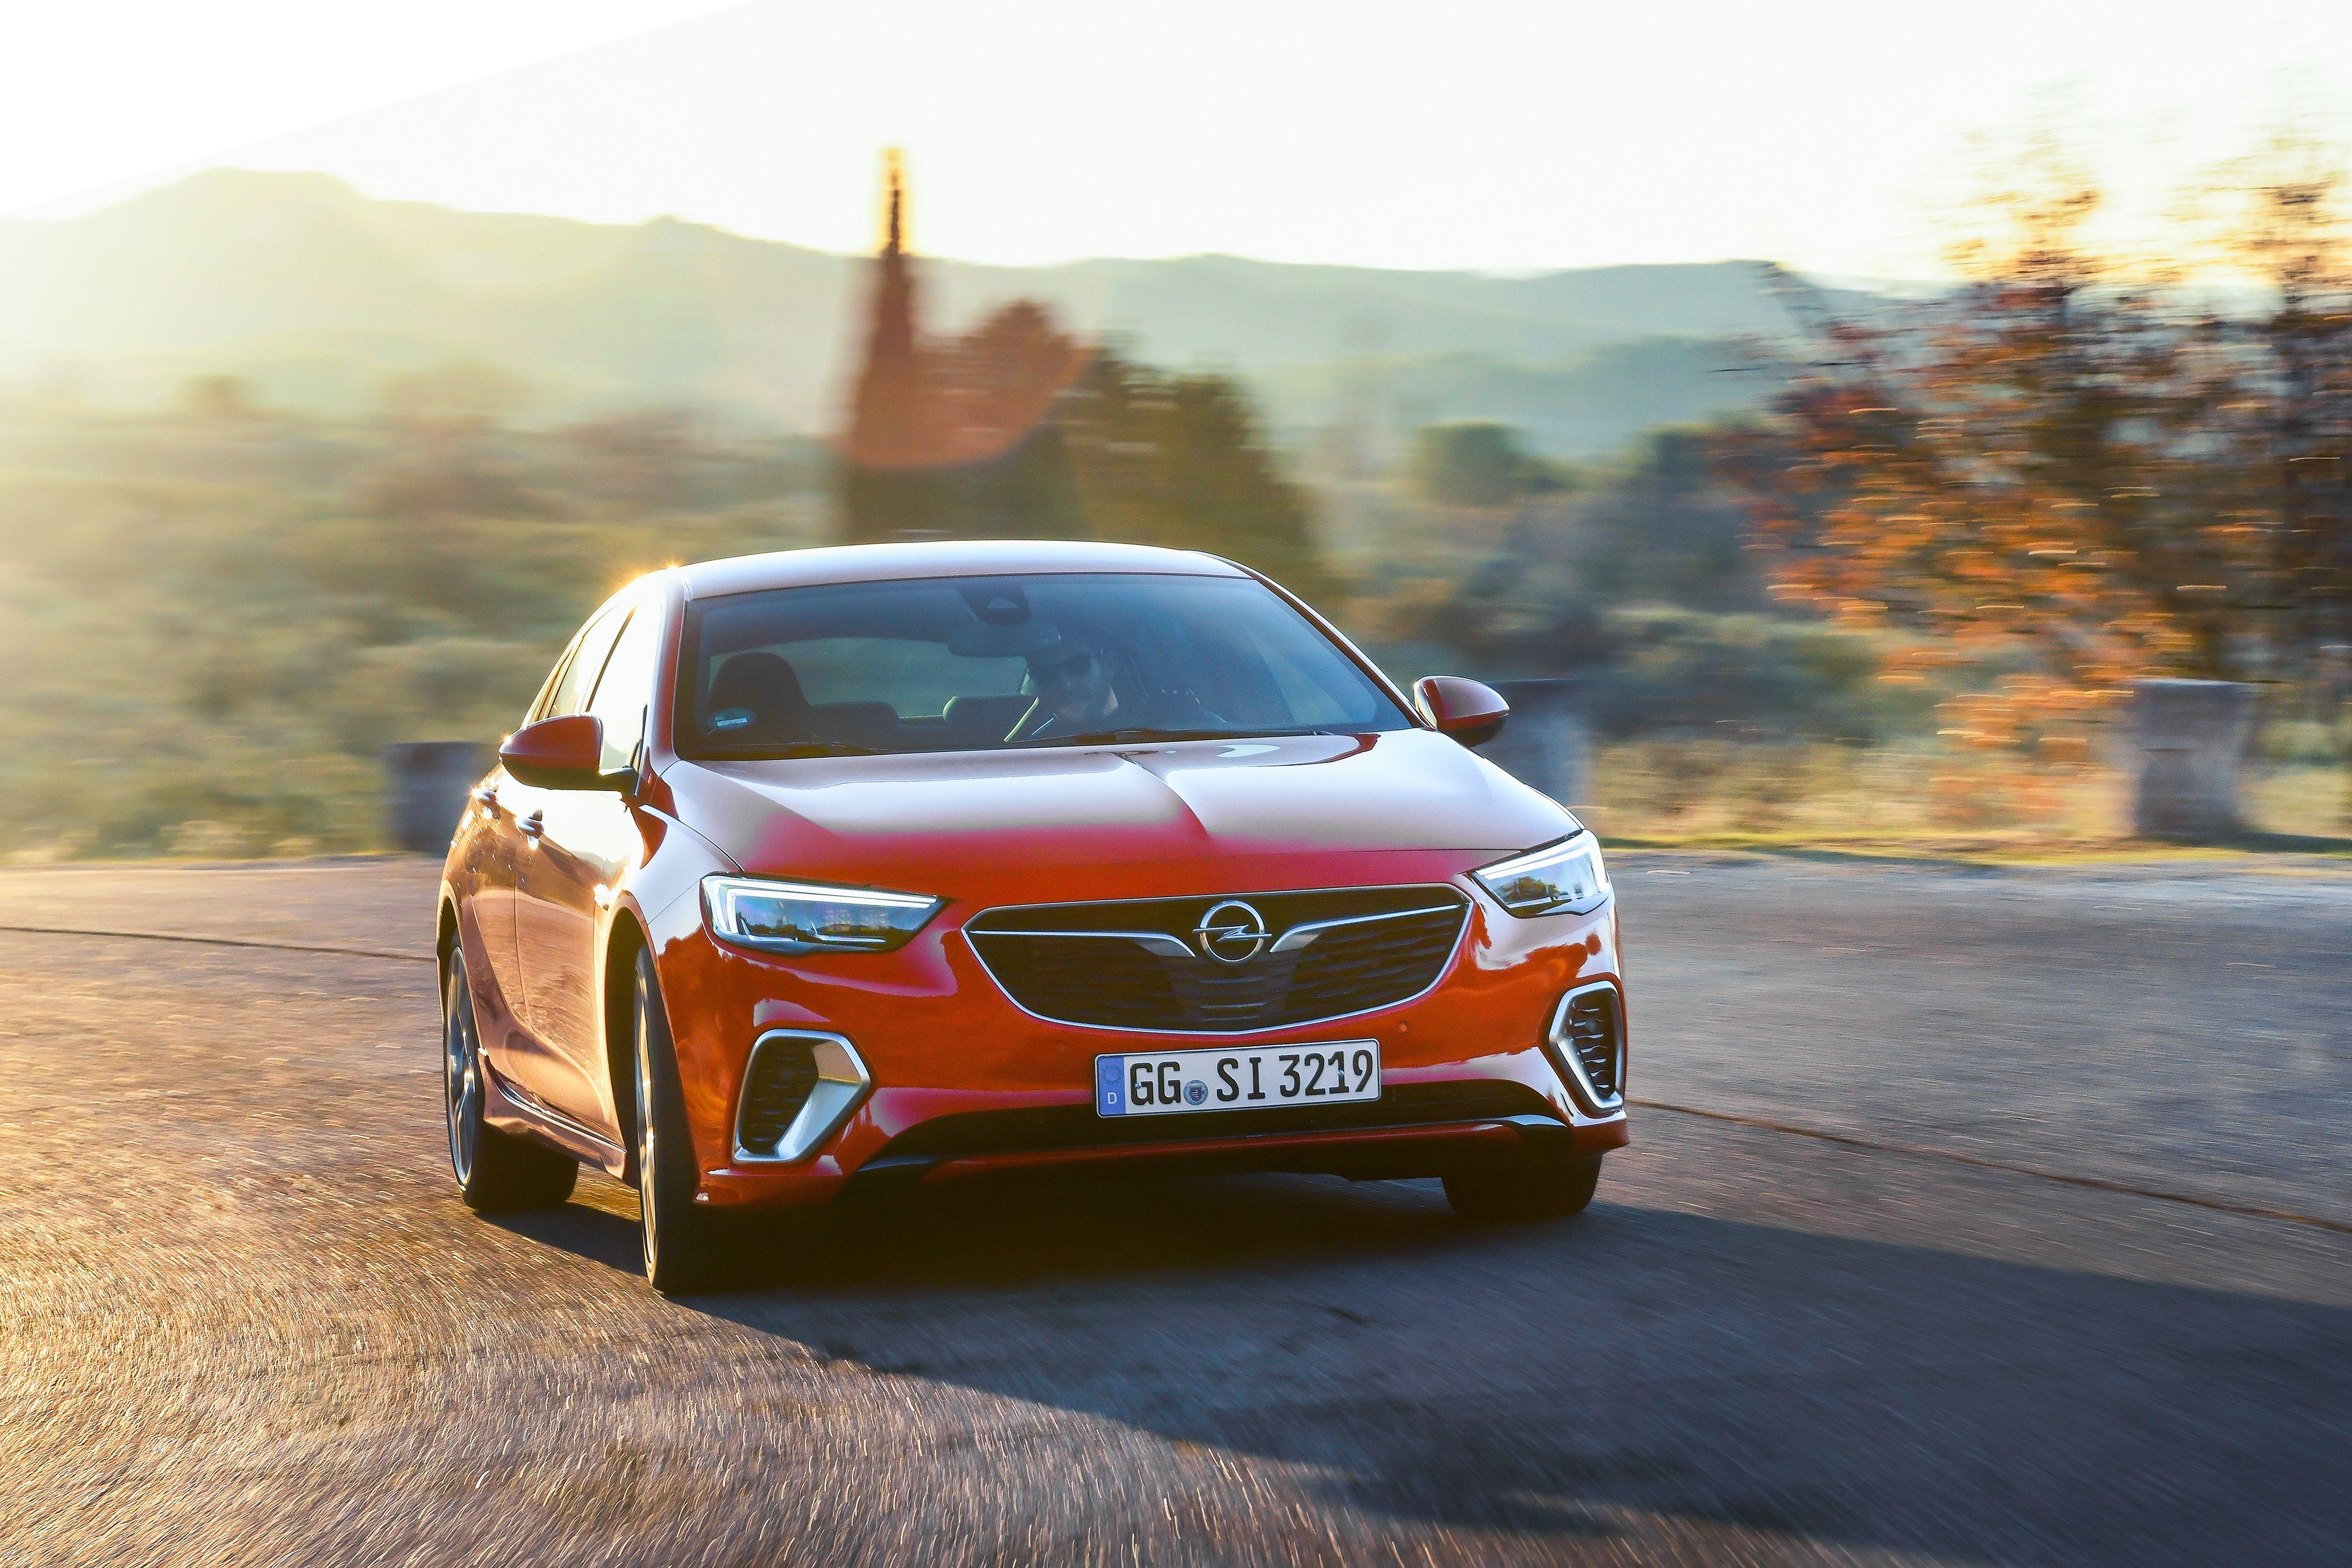 Opel Insignia Gsi 2018 Exterior Blitz